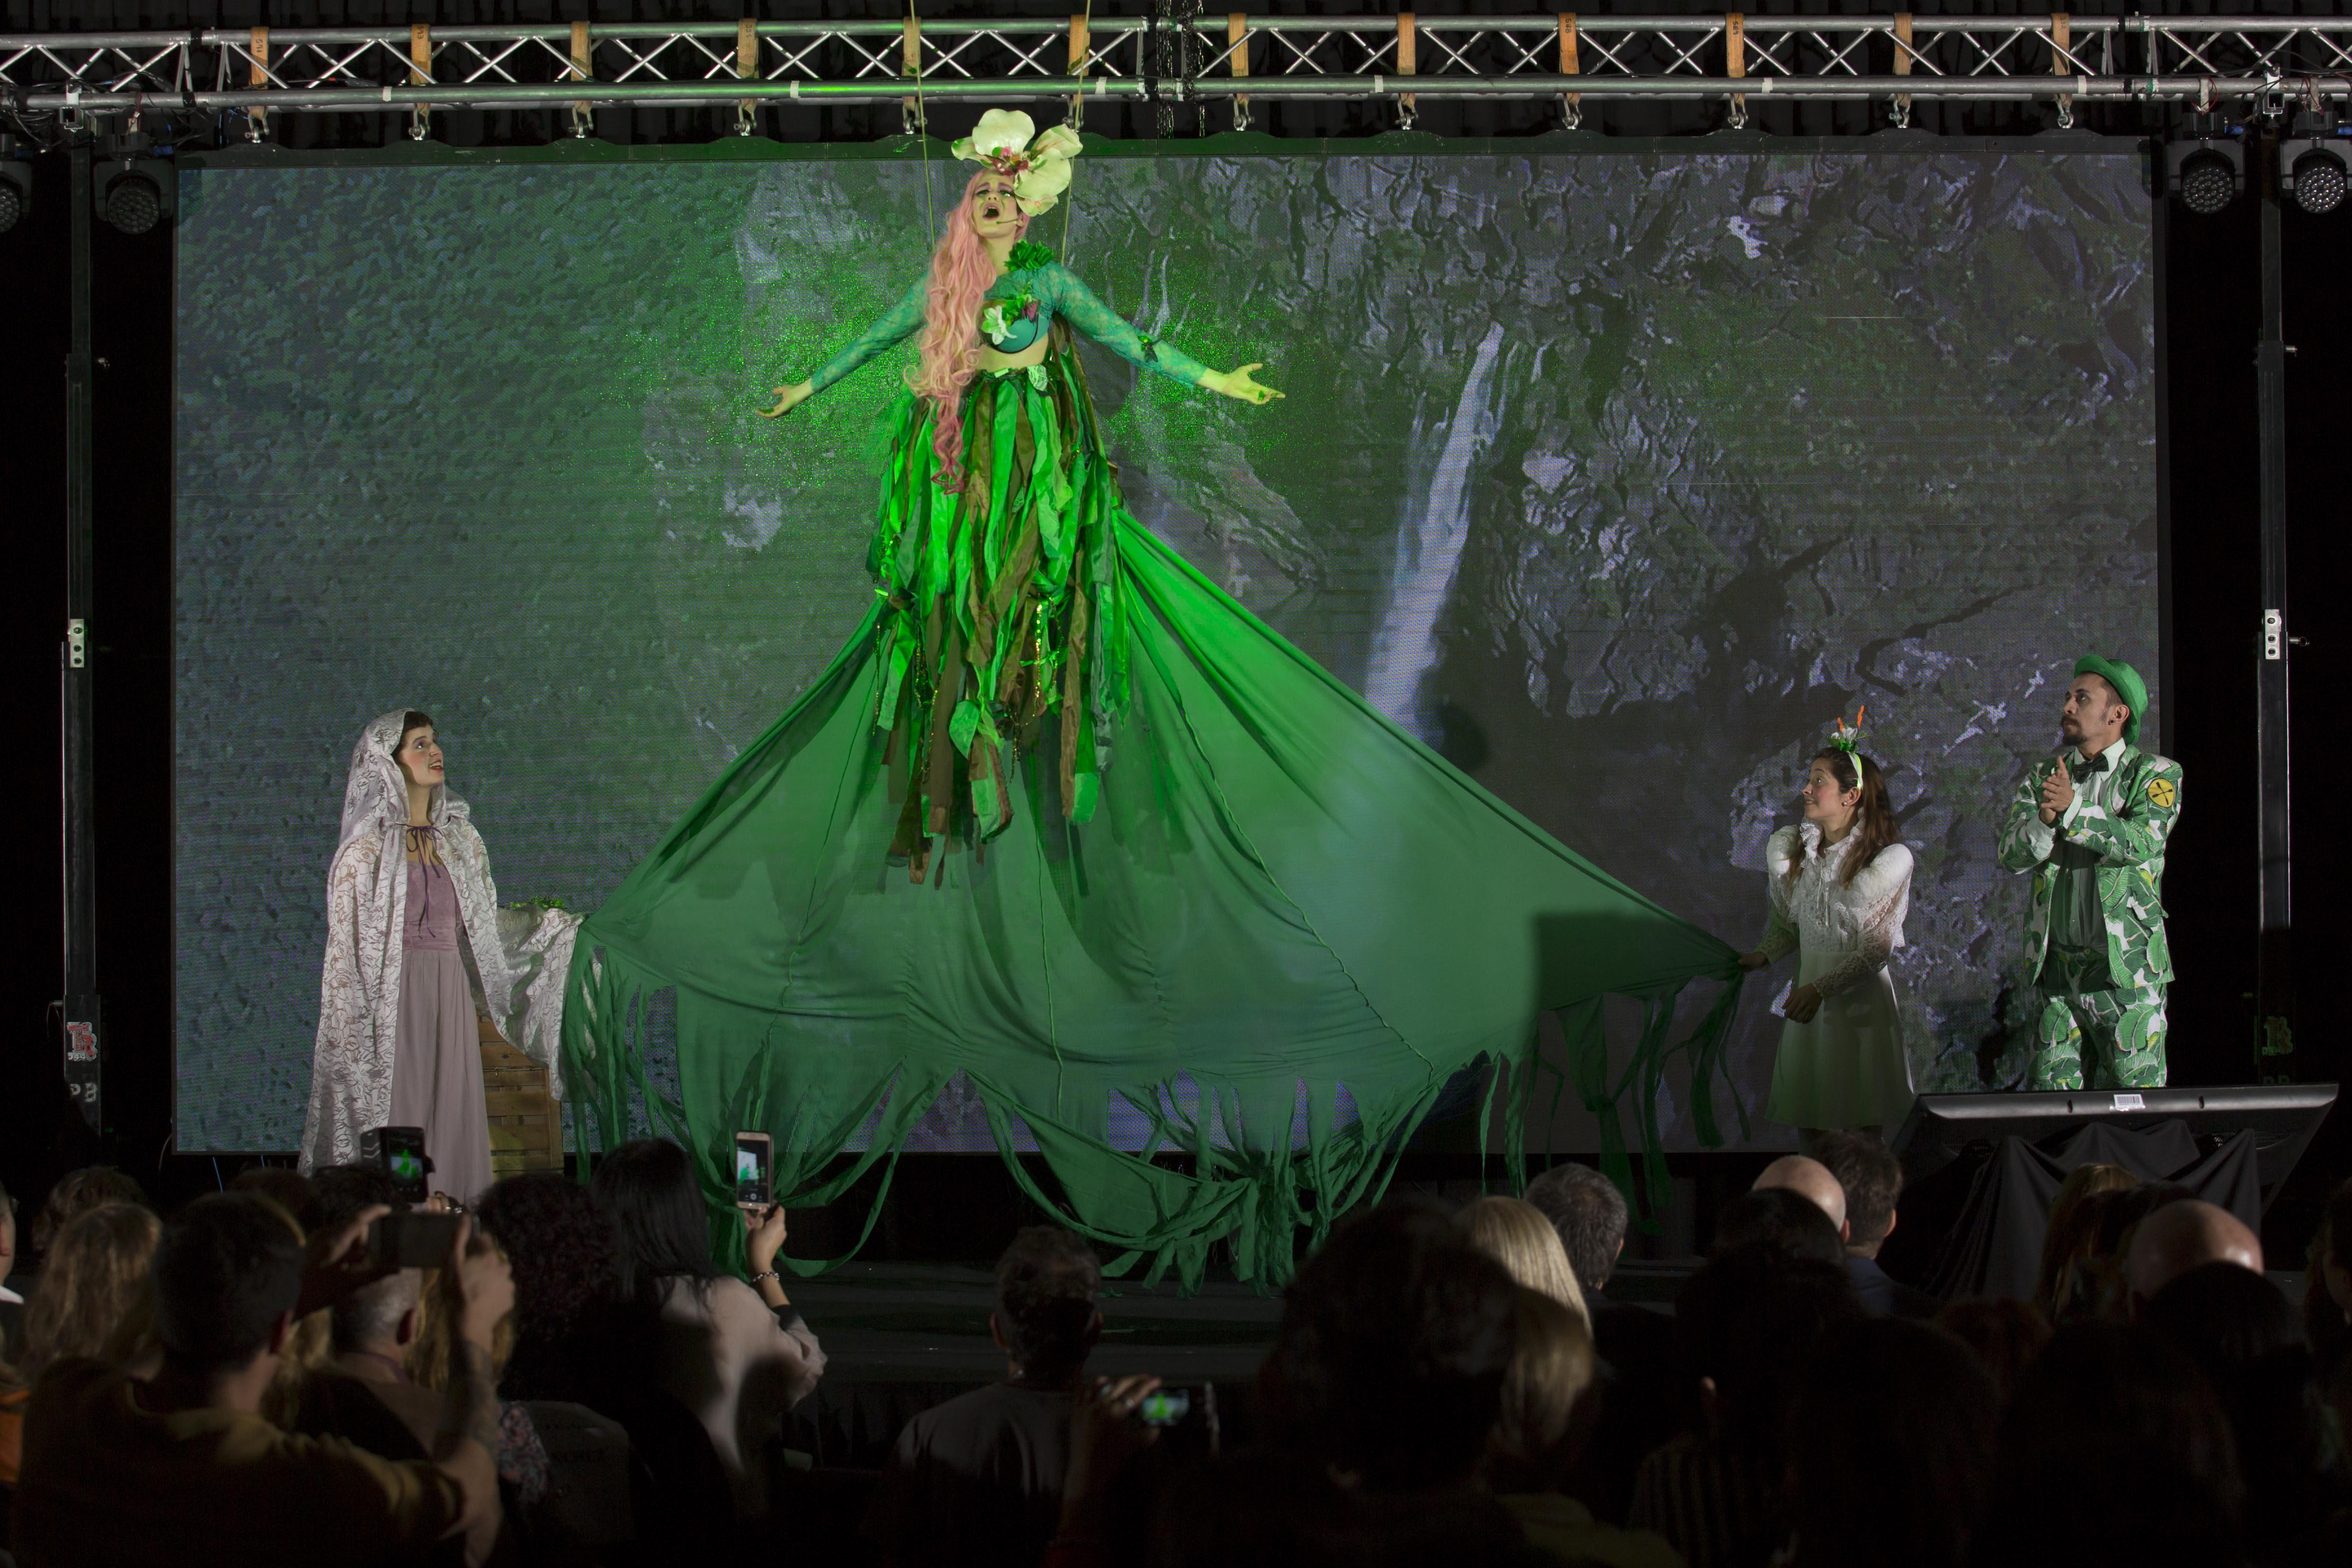 060 - show prismal biogreen - _MAT4297 - Matias Salgado